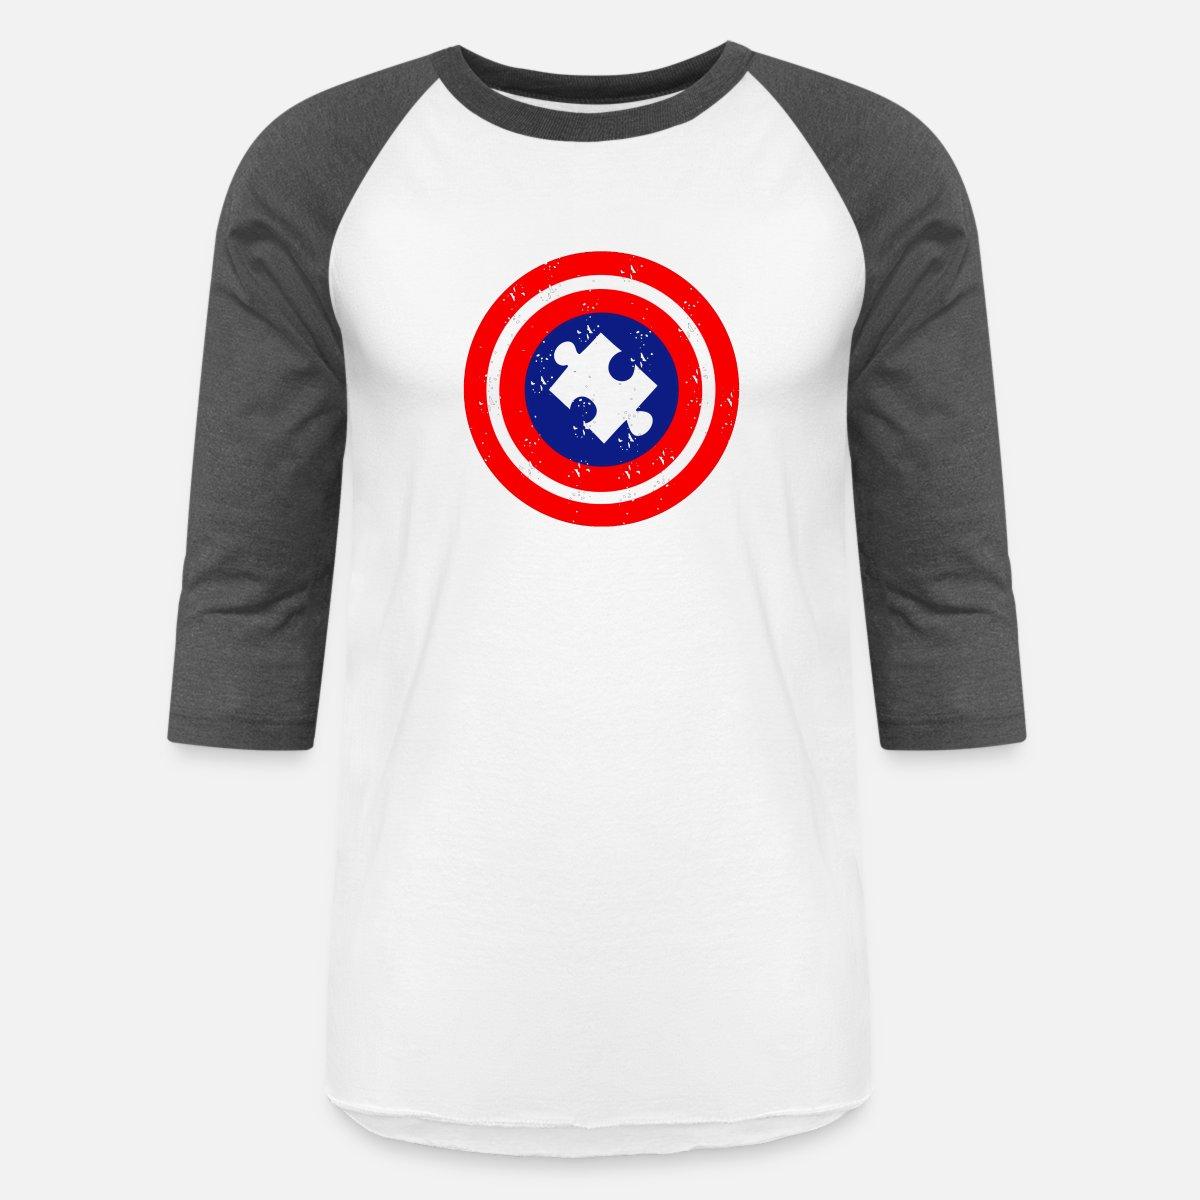 Autism Awareness Day Superhero Gift By Peterpan Spreadshirt Torch Tshirt Women Blue Black Navy Xl